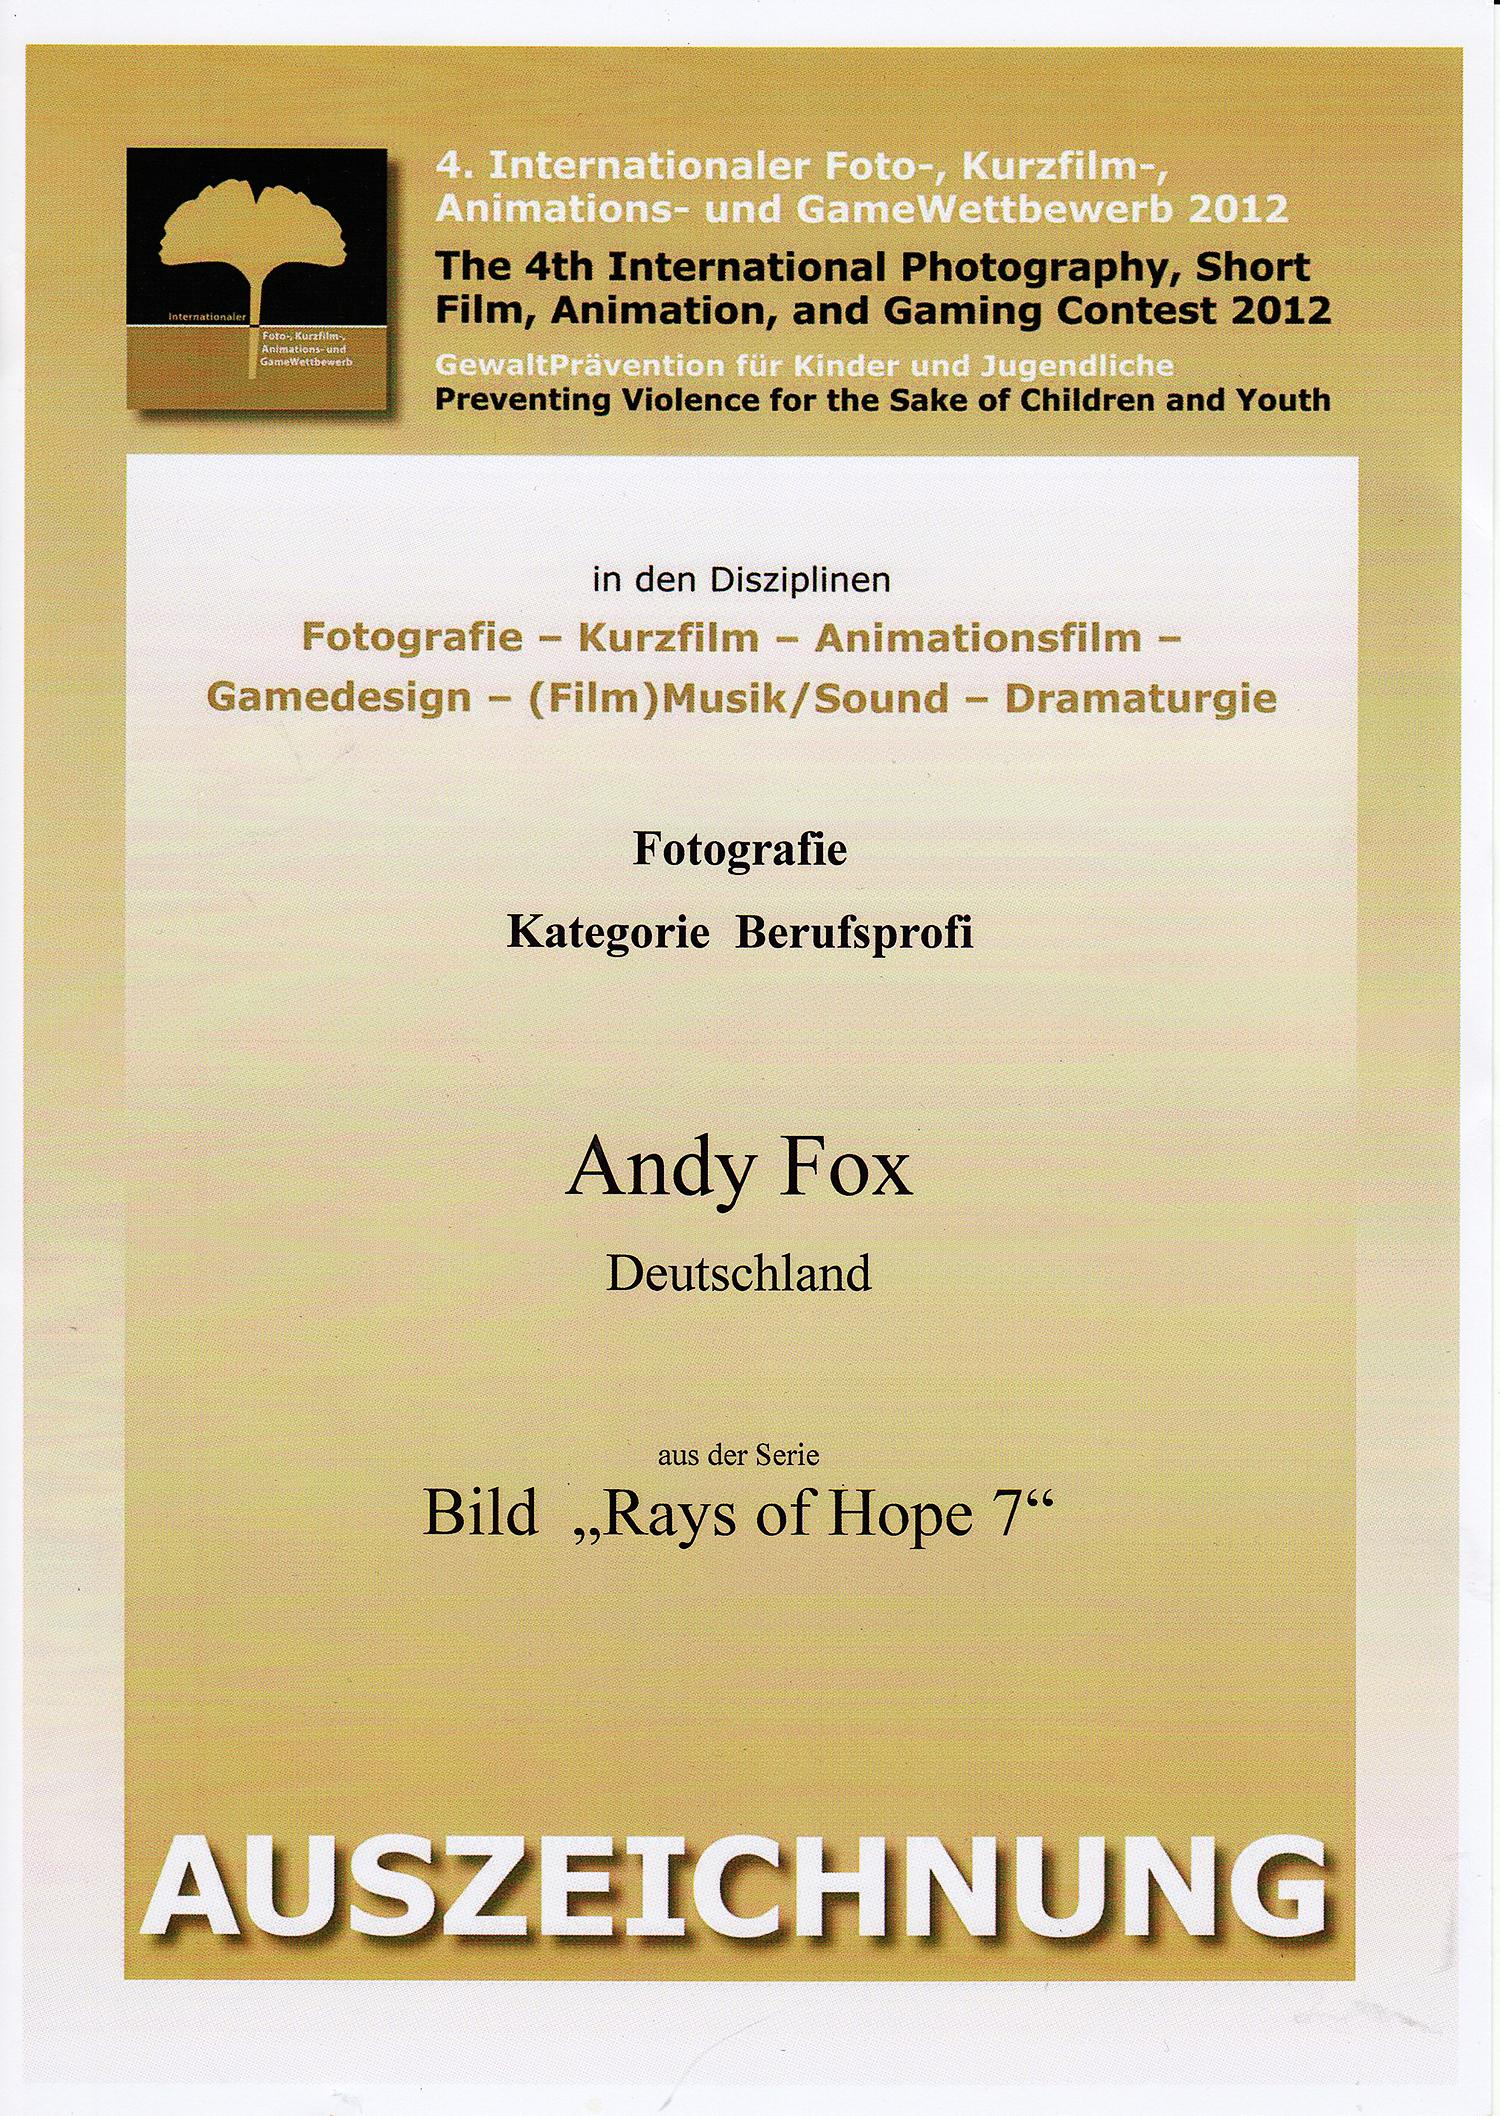 201210_FotoFilmGame-Award_Urkunde.jpg